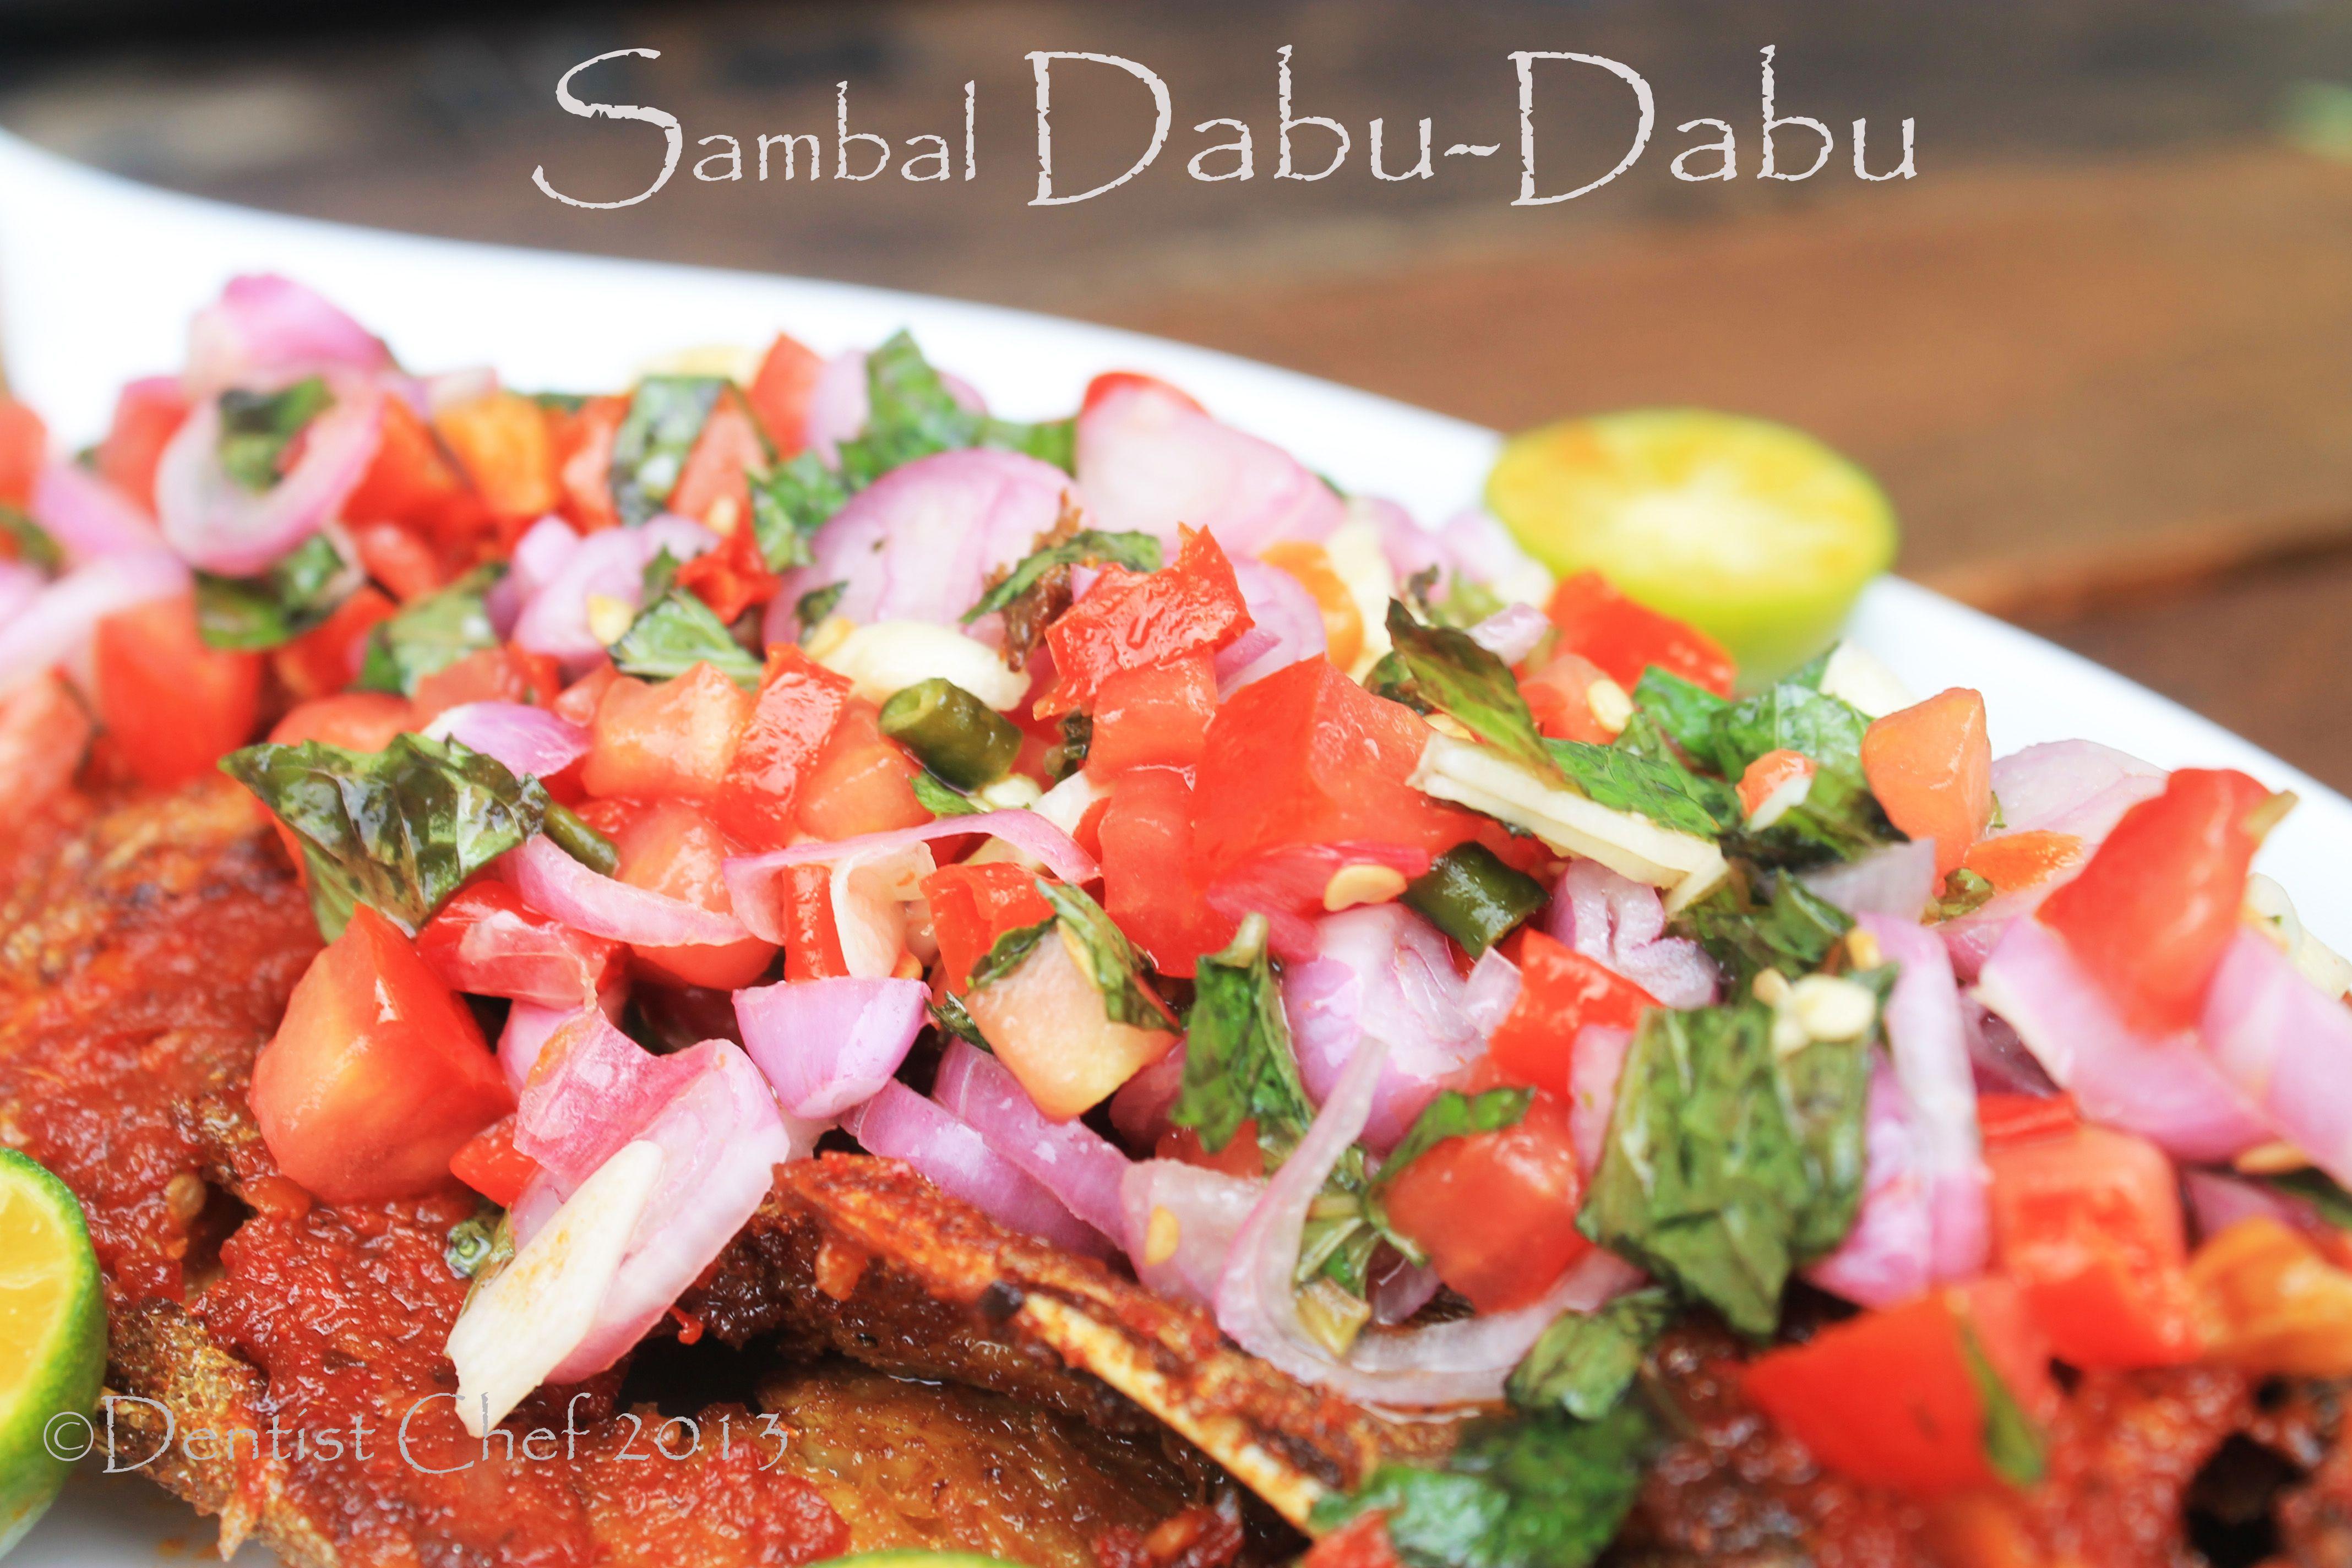 Resep Sambal Dabu Dabu Khas Manado Manadonese Raw Chilli Salsa Merica Masakan Resep Masakan Asia